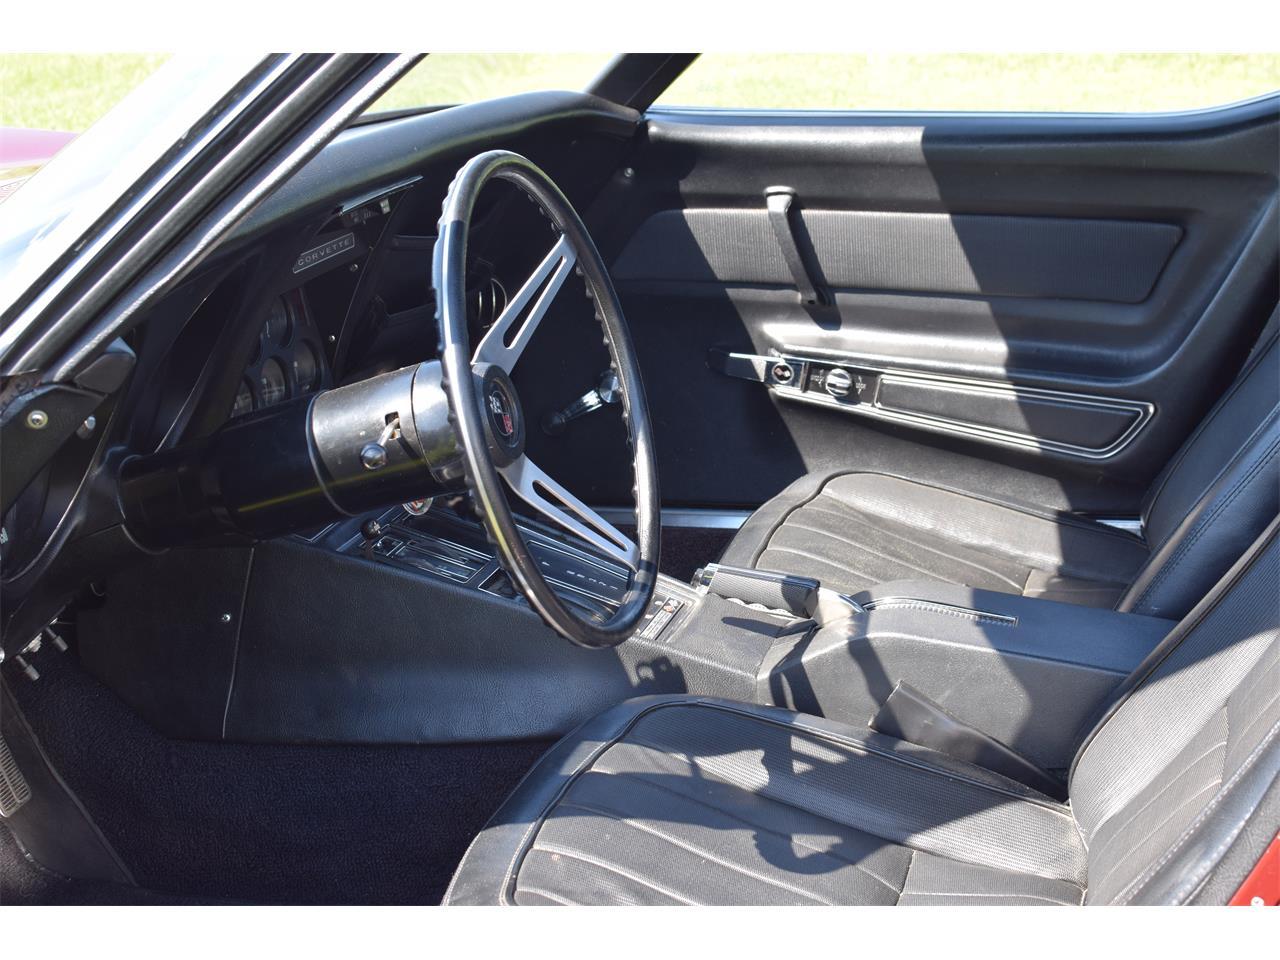 1969 Chevrolet Corvette (CC-1228361) for sale in Watertown, Minnesota